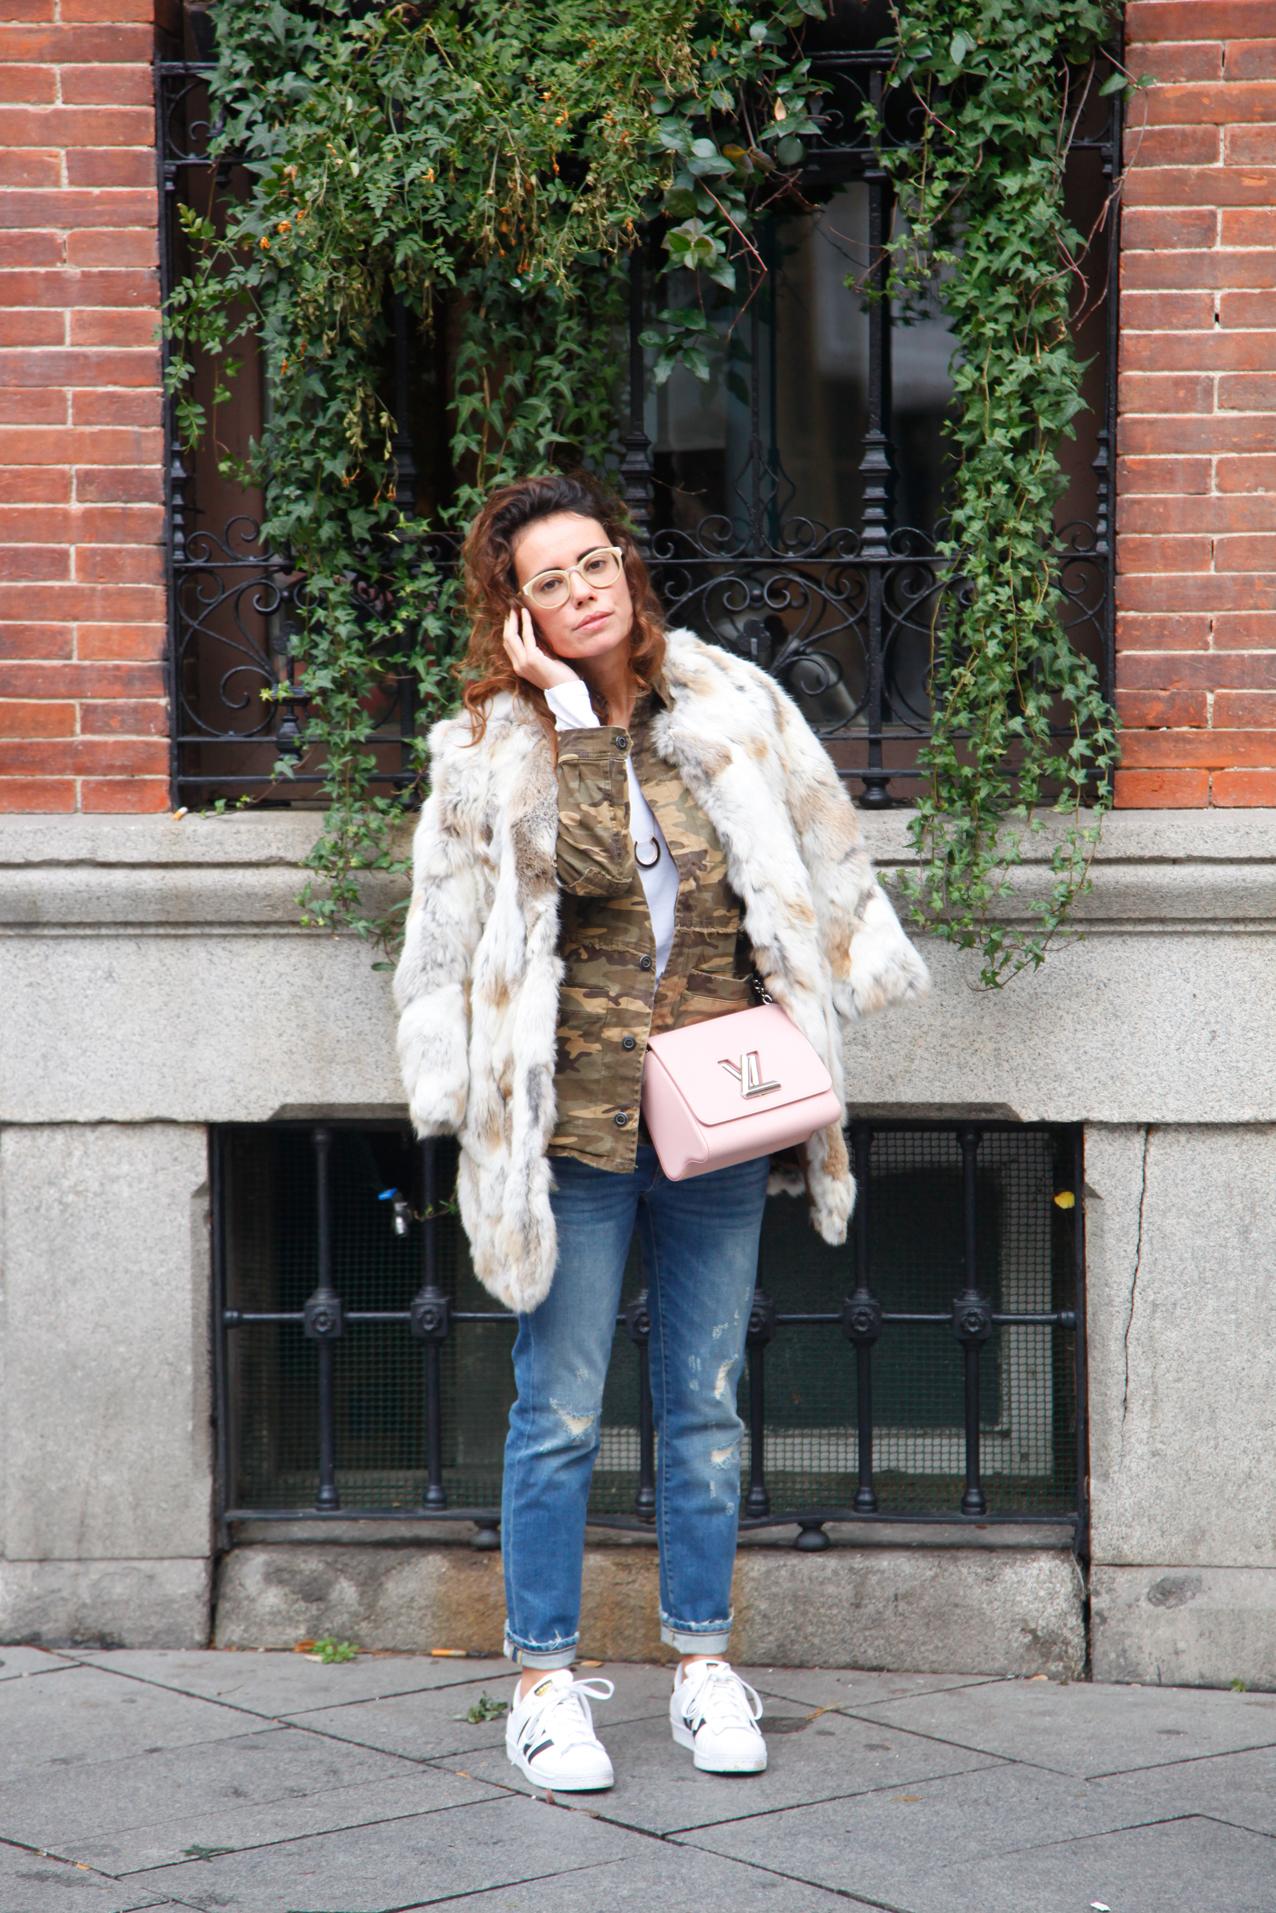 militar jacket, cool lemonade, cozy look, streetstyle, blogger, fashion blog